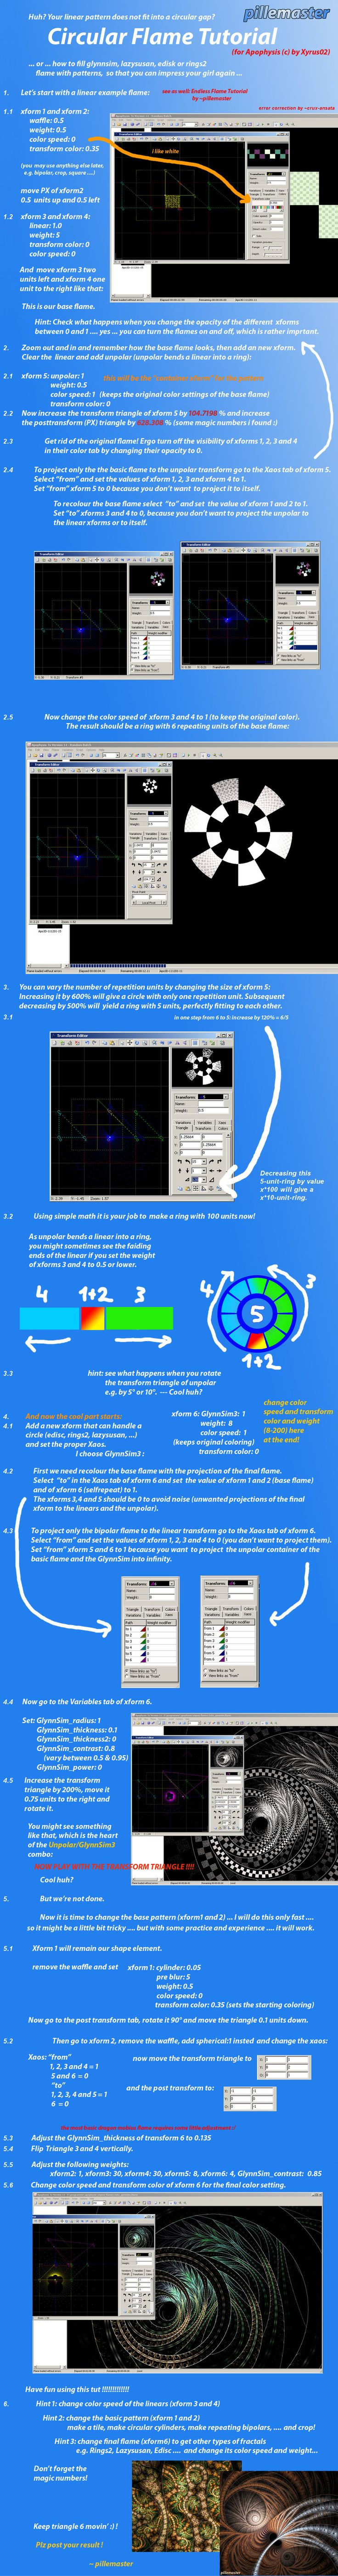 Circular Flame Tutorial or Unpolar+GlynnSim by pillemaster on DeviantArt